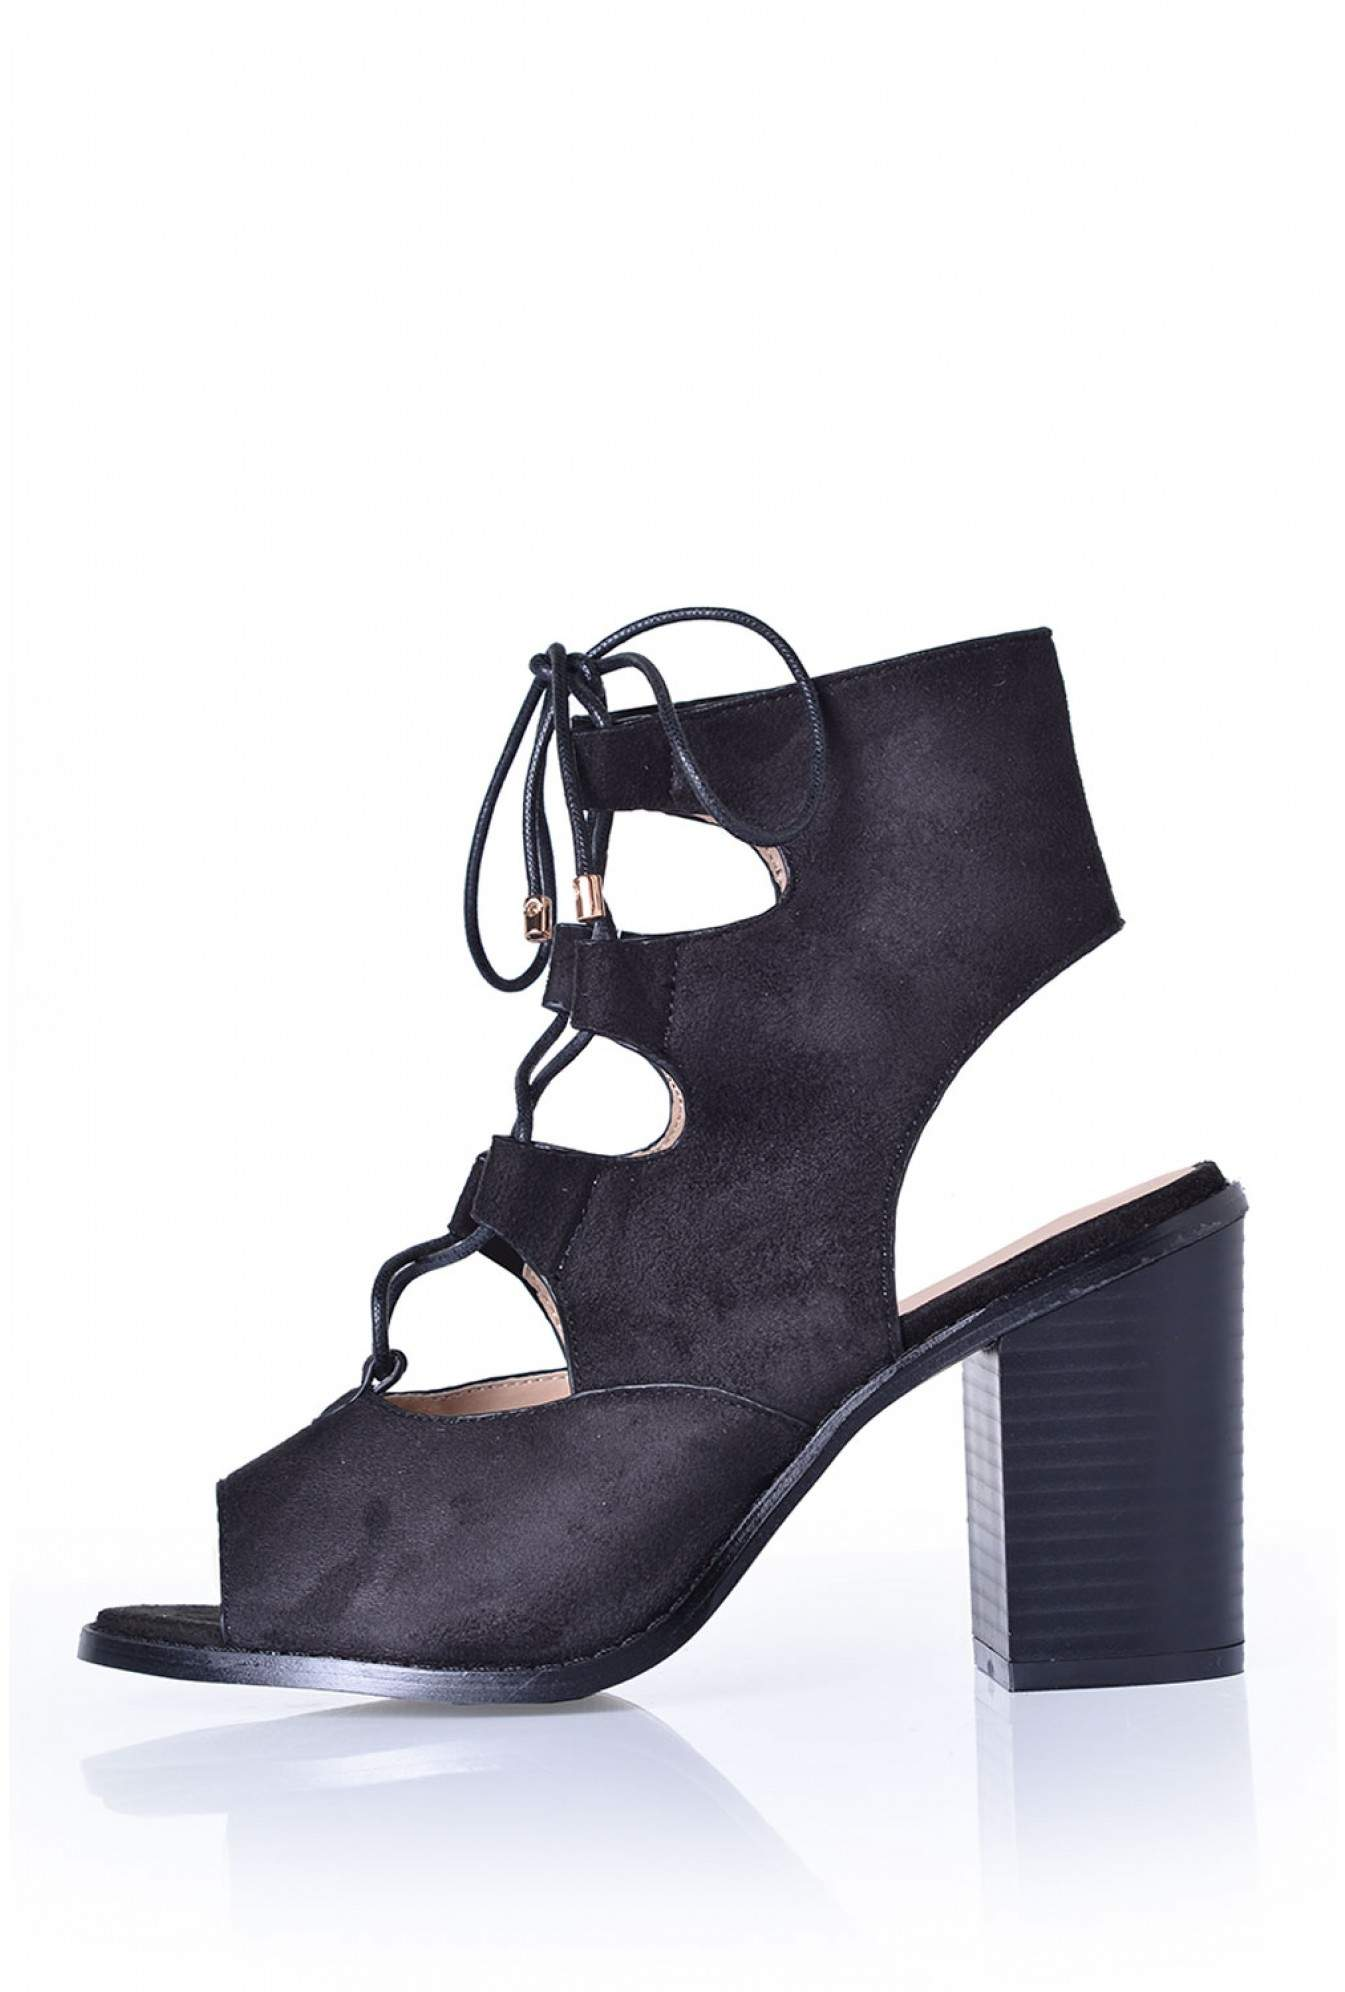 53bc1fce6c5 Indigo Footwear Lenni Open Heel Sandals in Black Suede